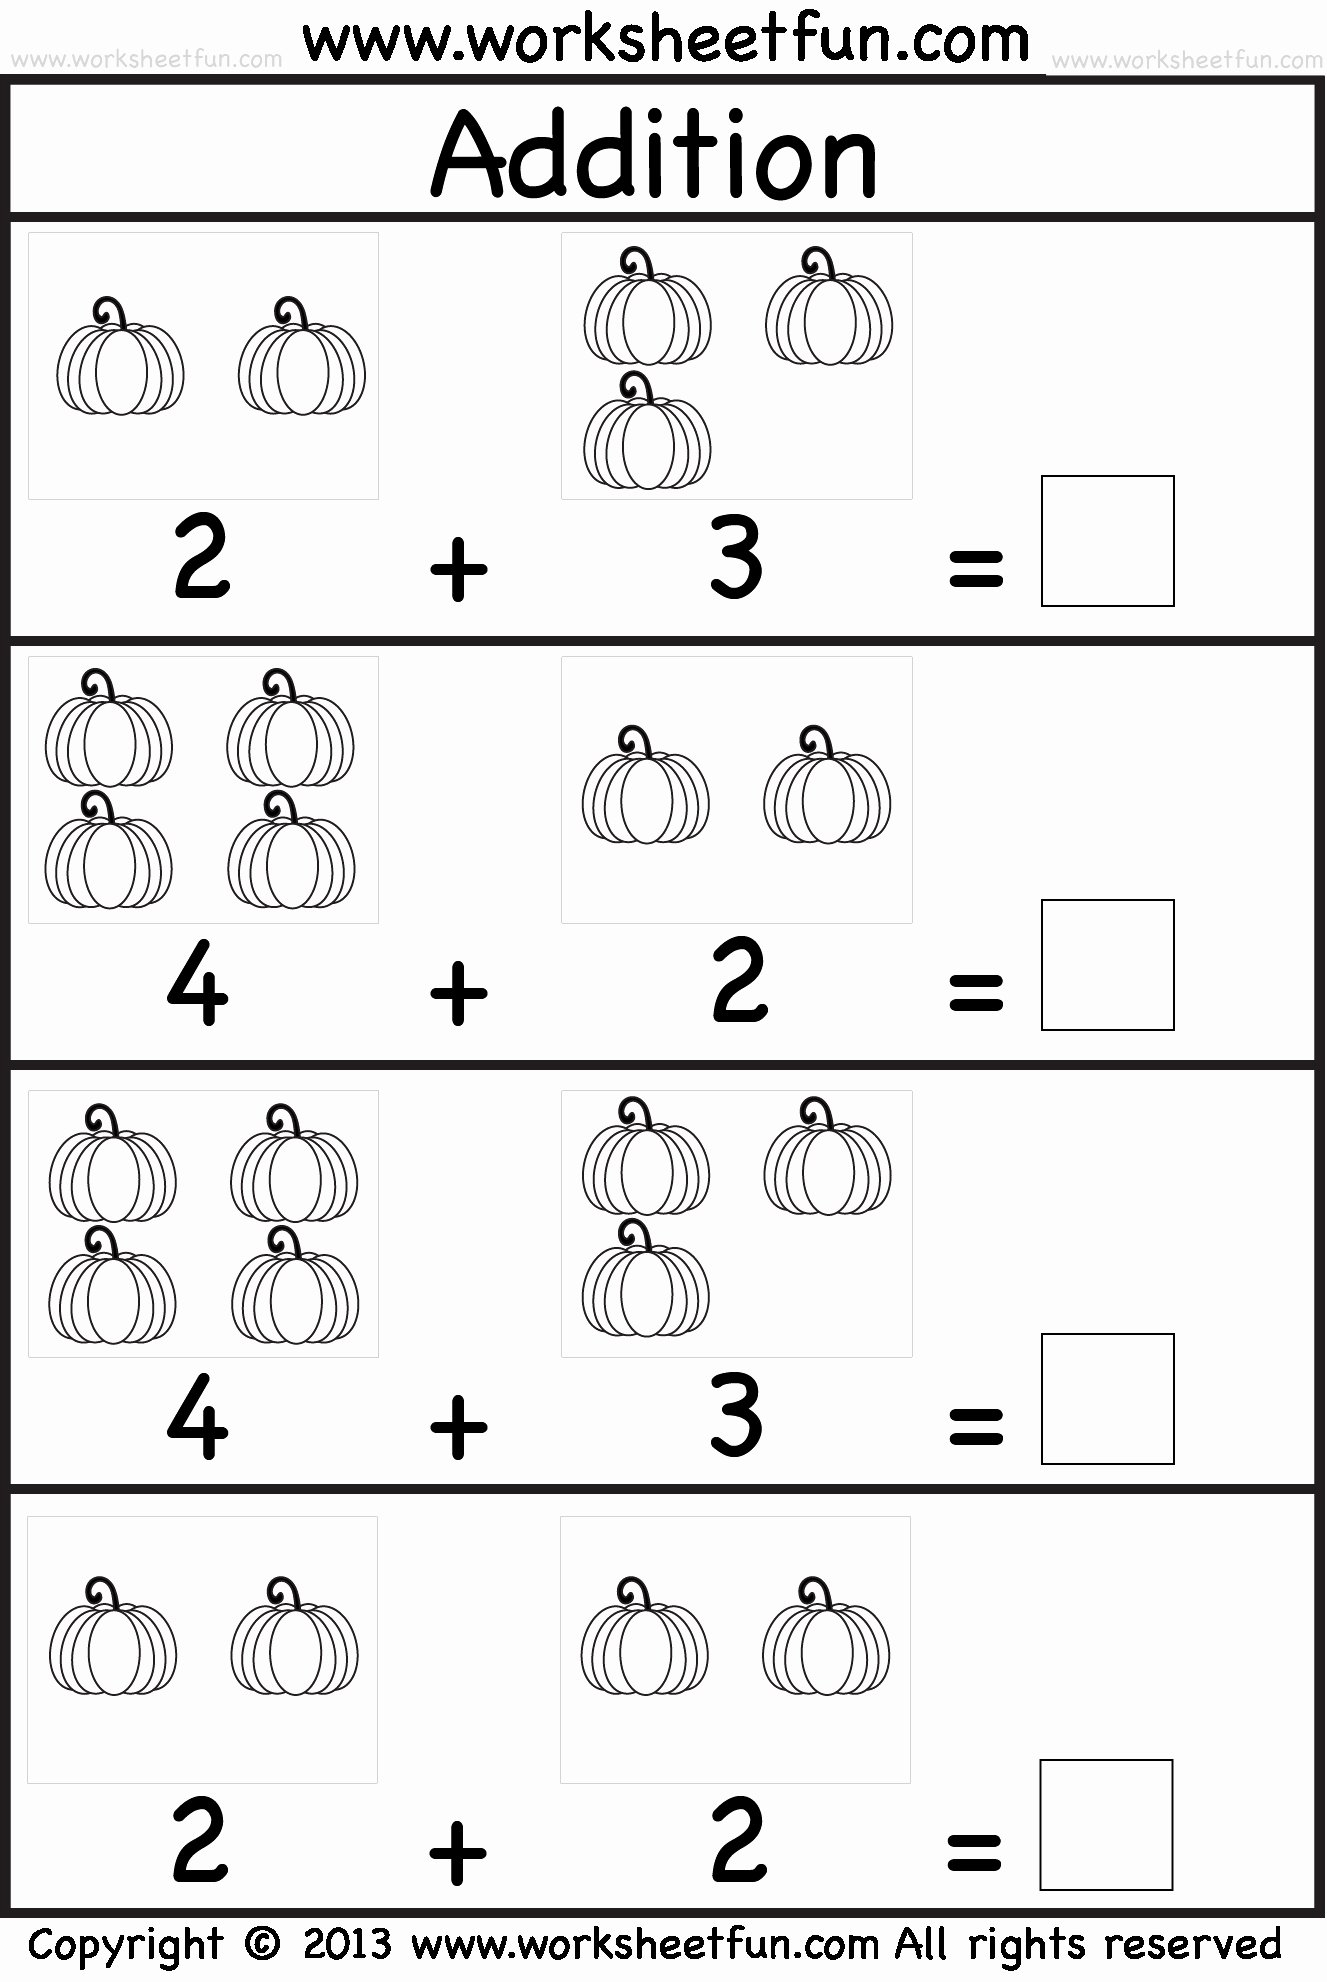 Worksheets for Preschoolers In Math top Kindergarten Math Worksheets for Printable Preschool